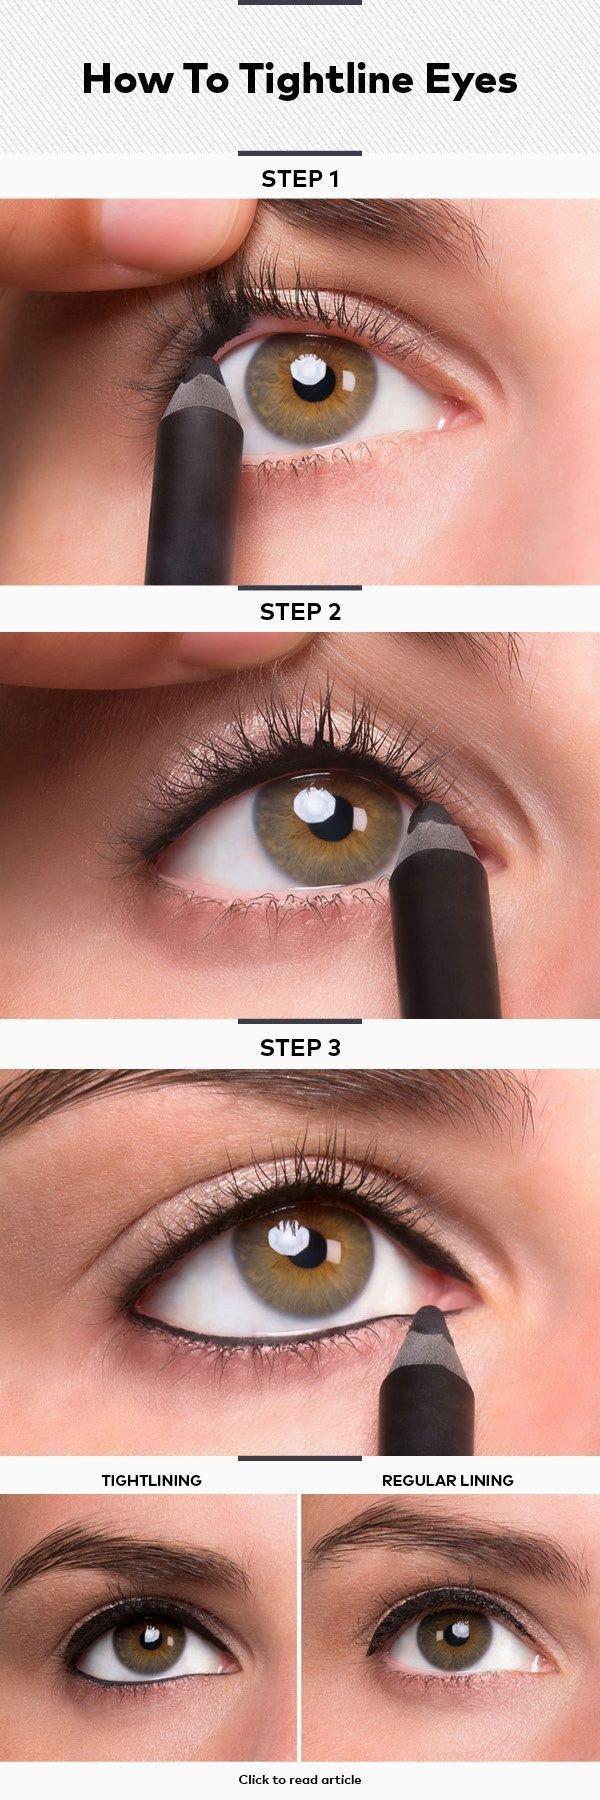 eyebrow,face,brown,eye,vision care,